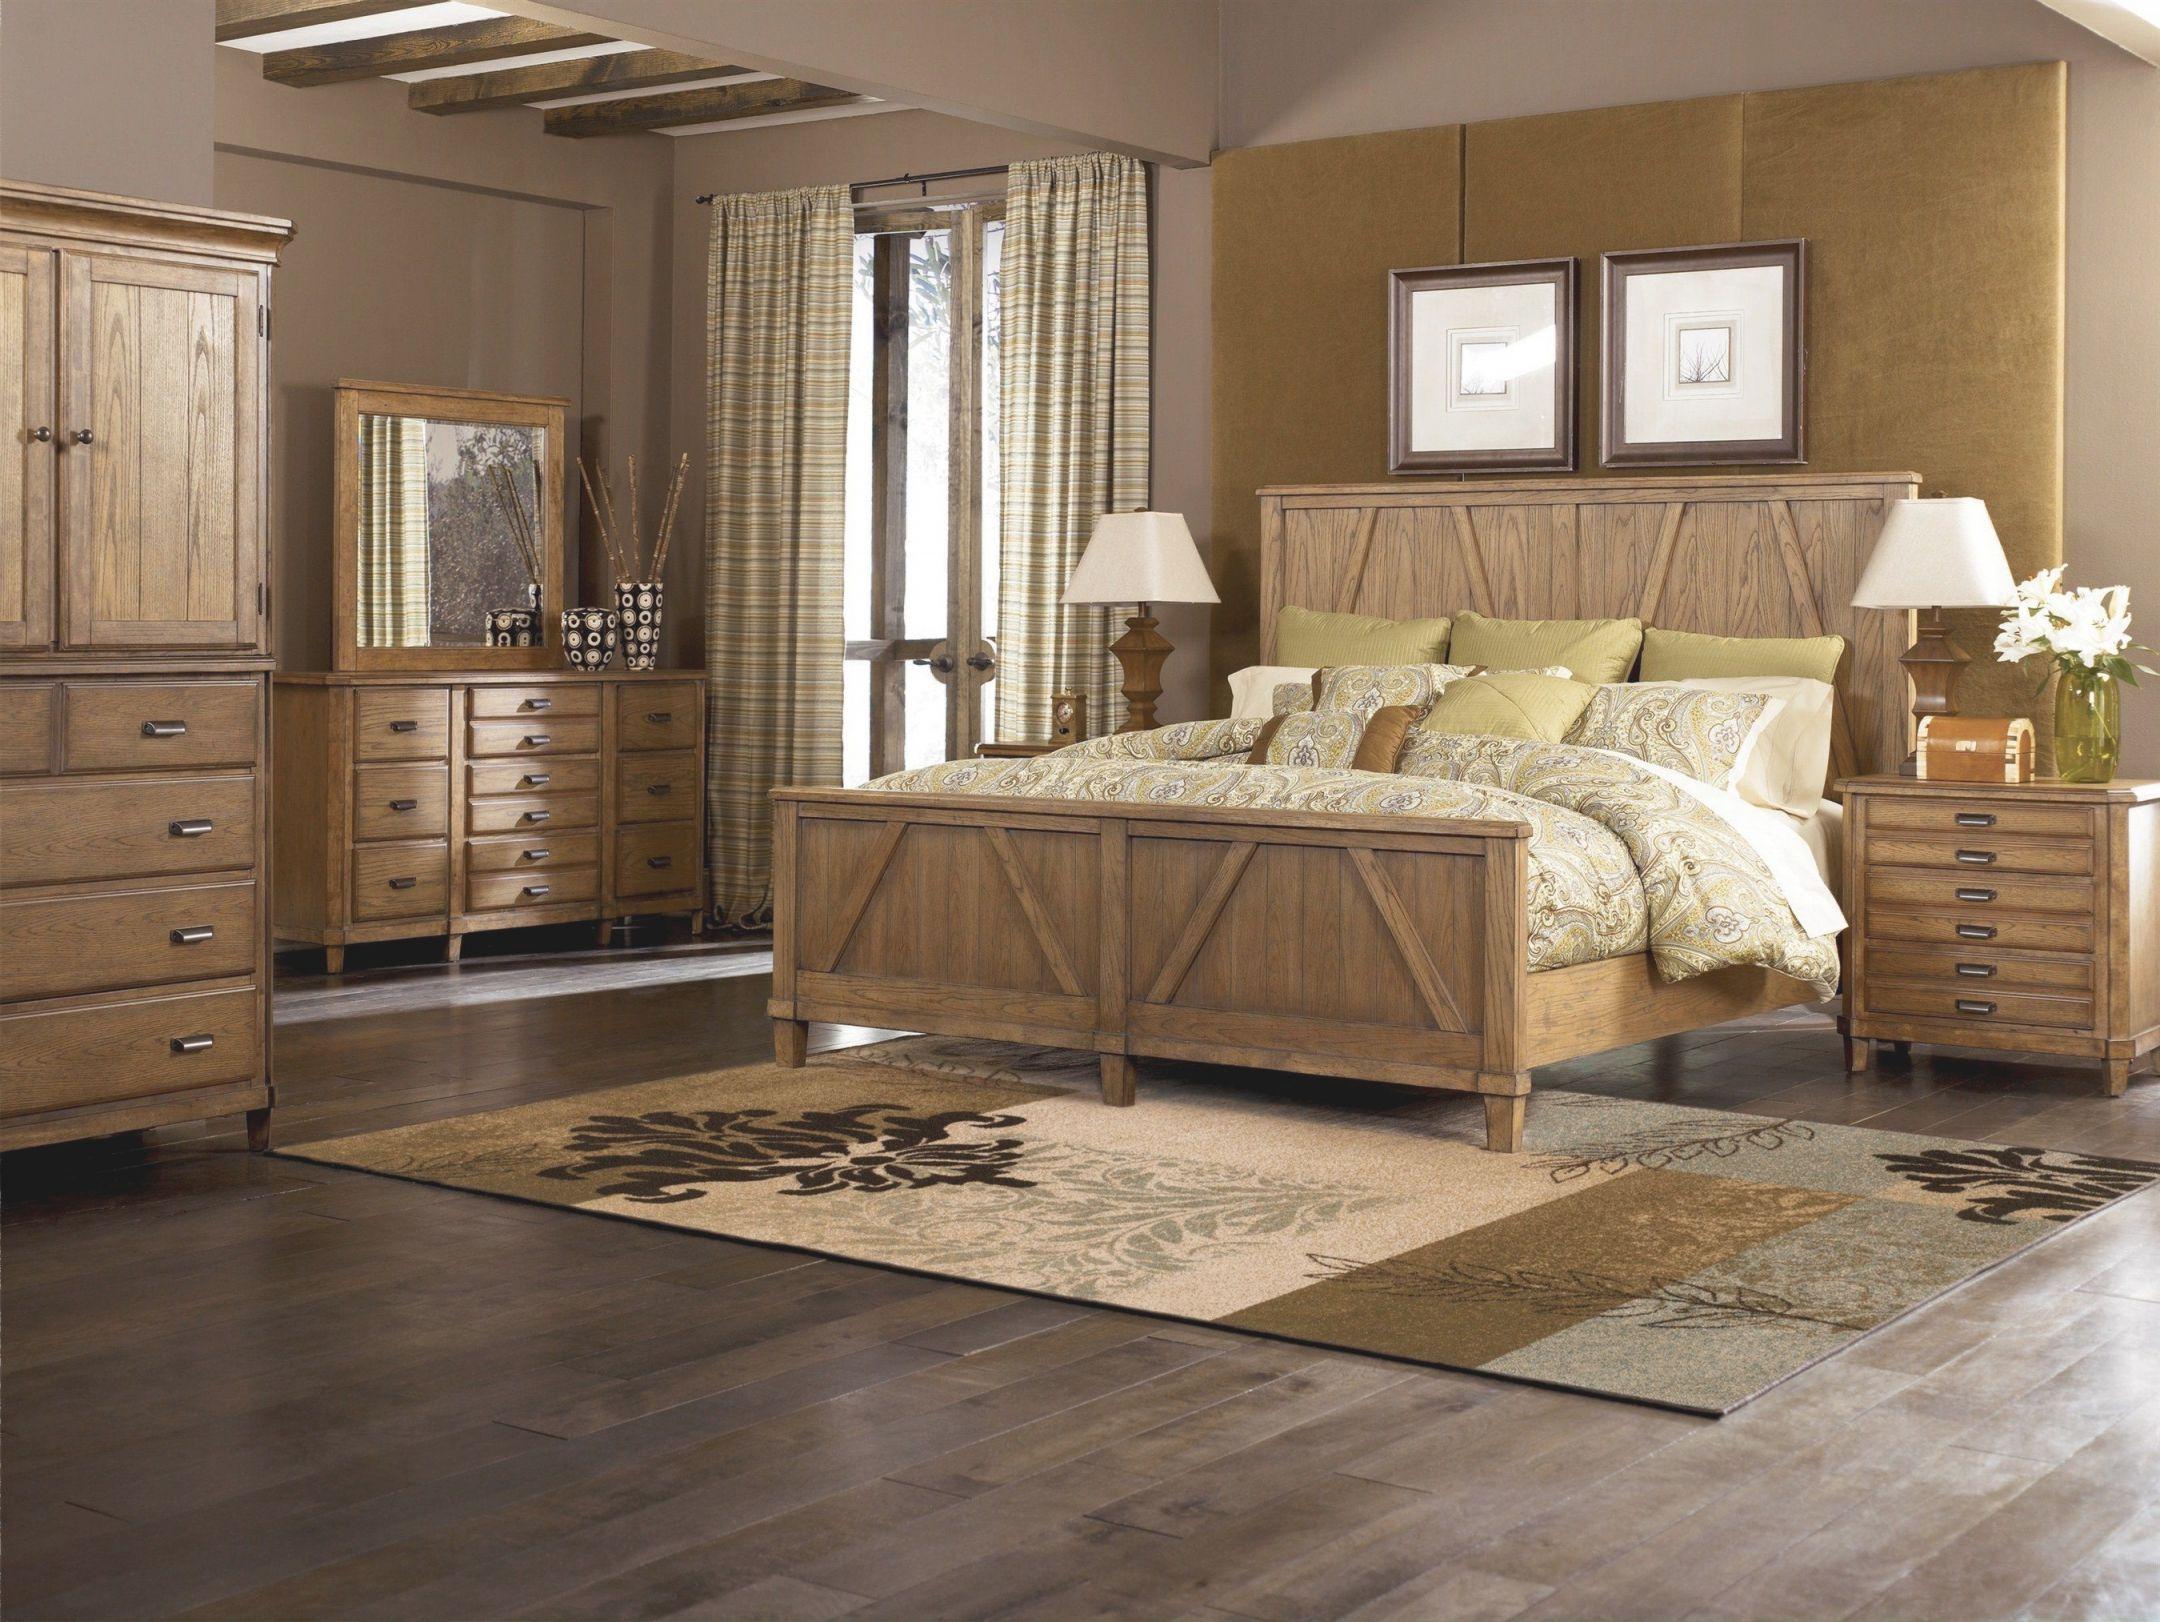 Bedroom Design : Western Headboards Rustic Sets Distressed intended for Unique Rustic Bedroom Furniture Sets